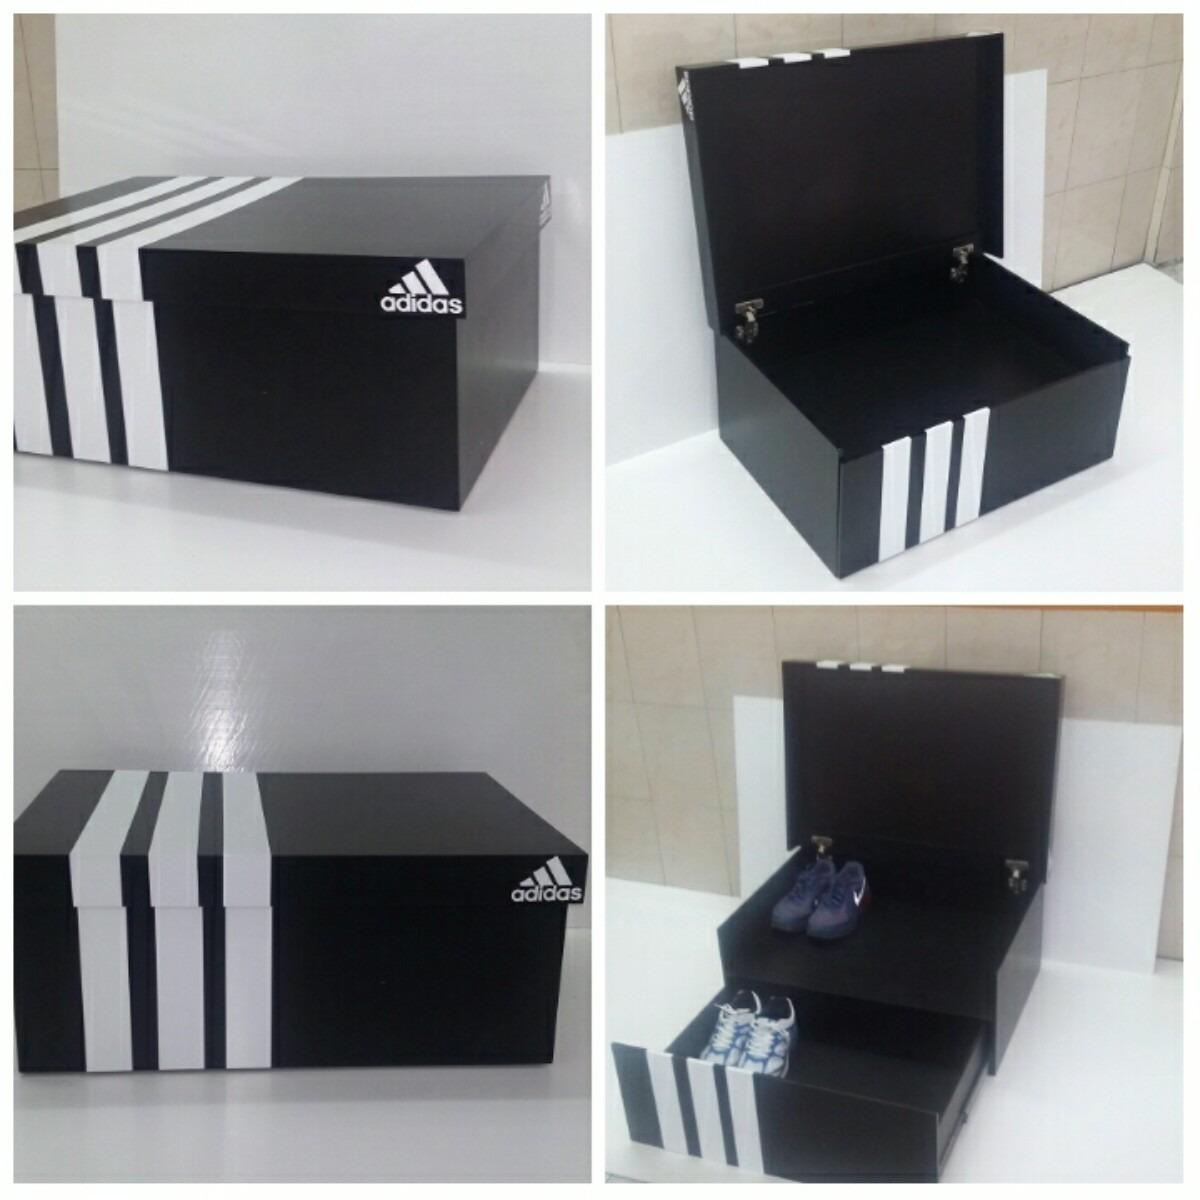 Zapatera mueble en forma de caja de zapatos bs for Mueble para zapatos madera